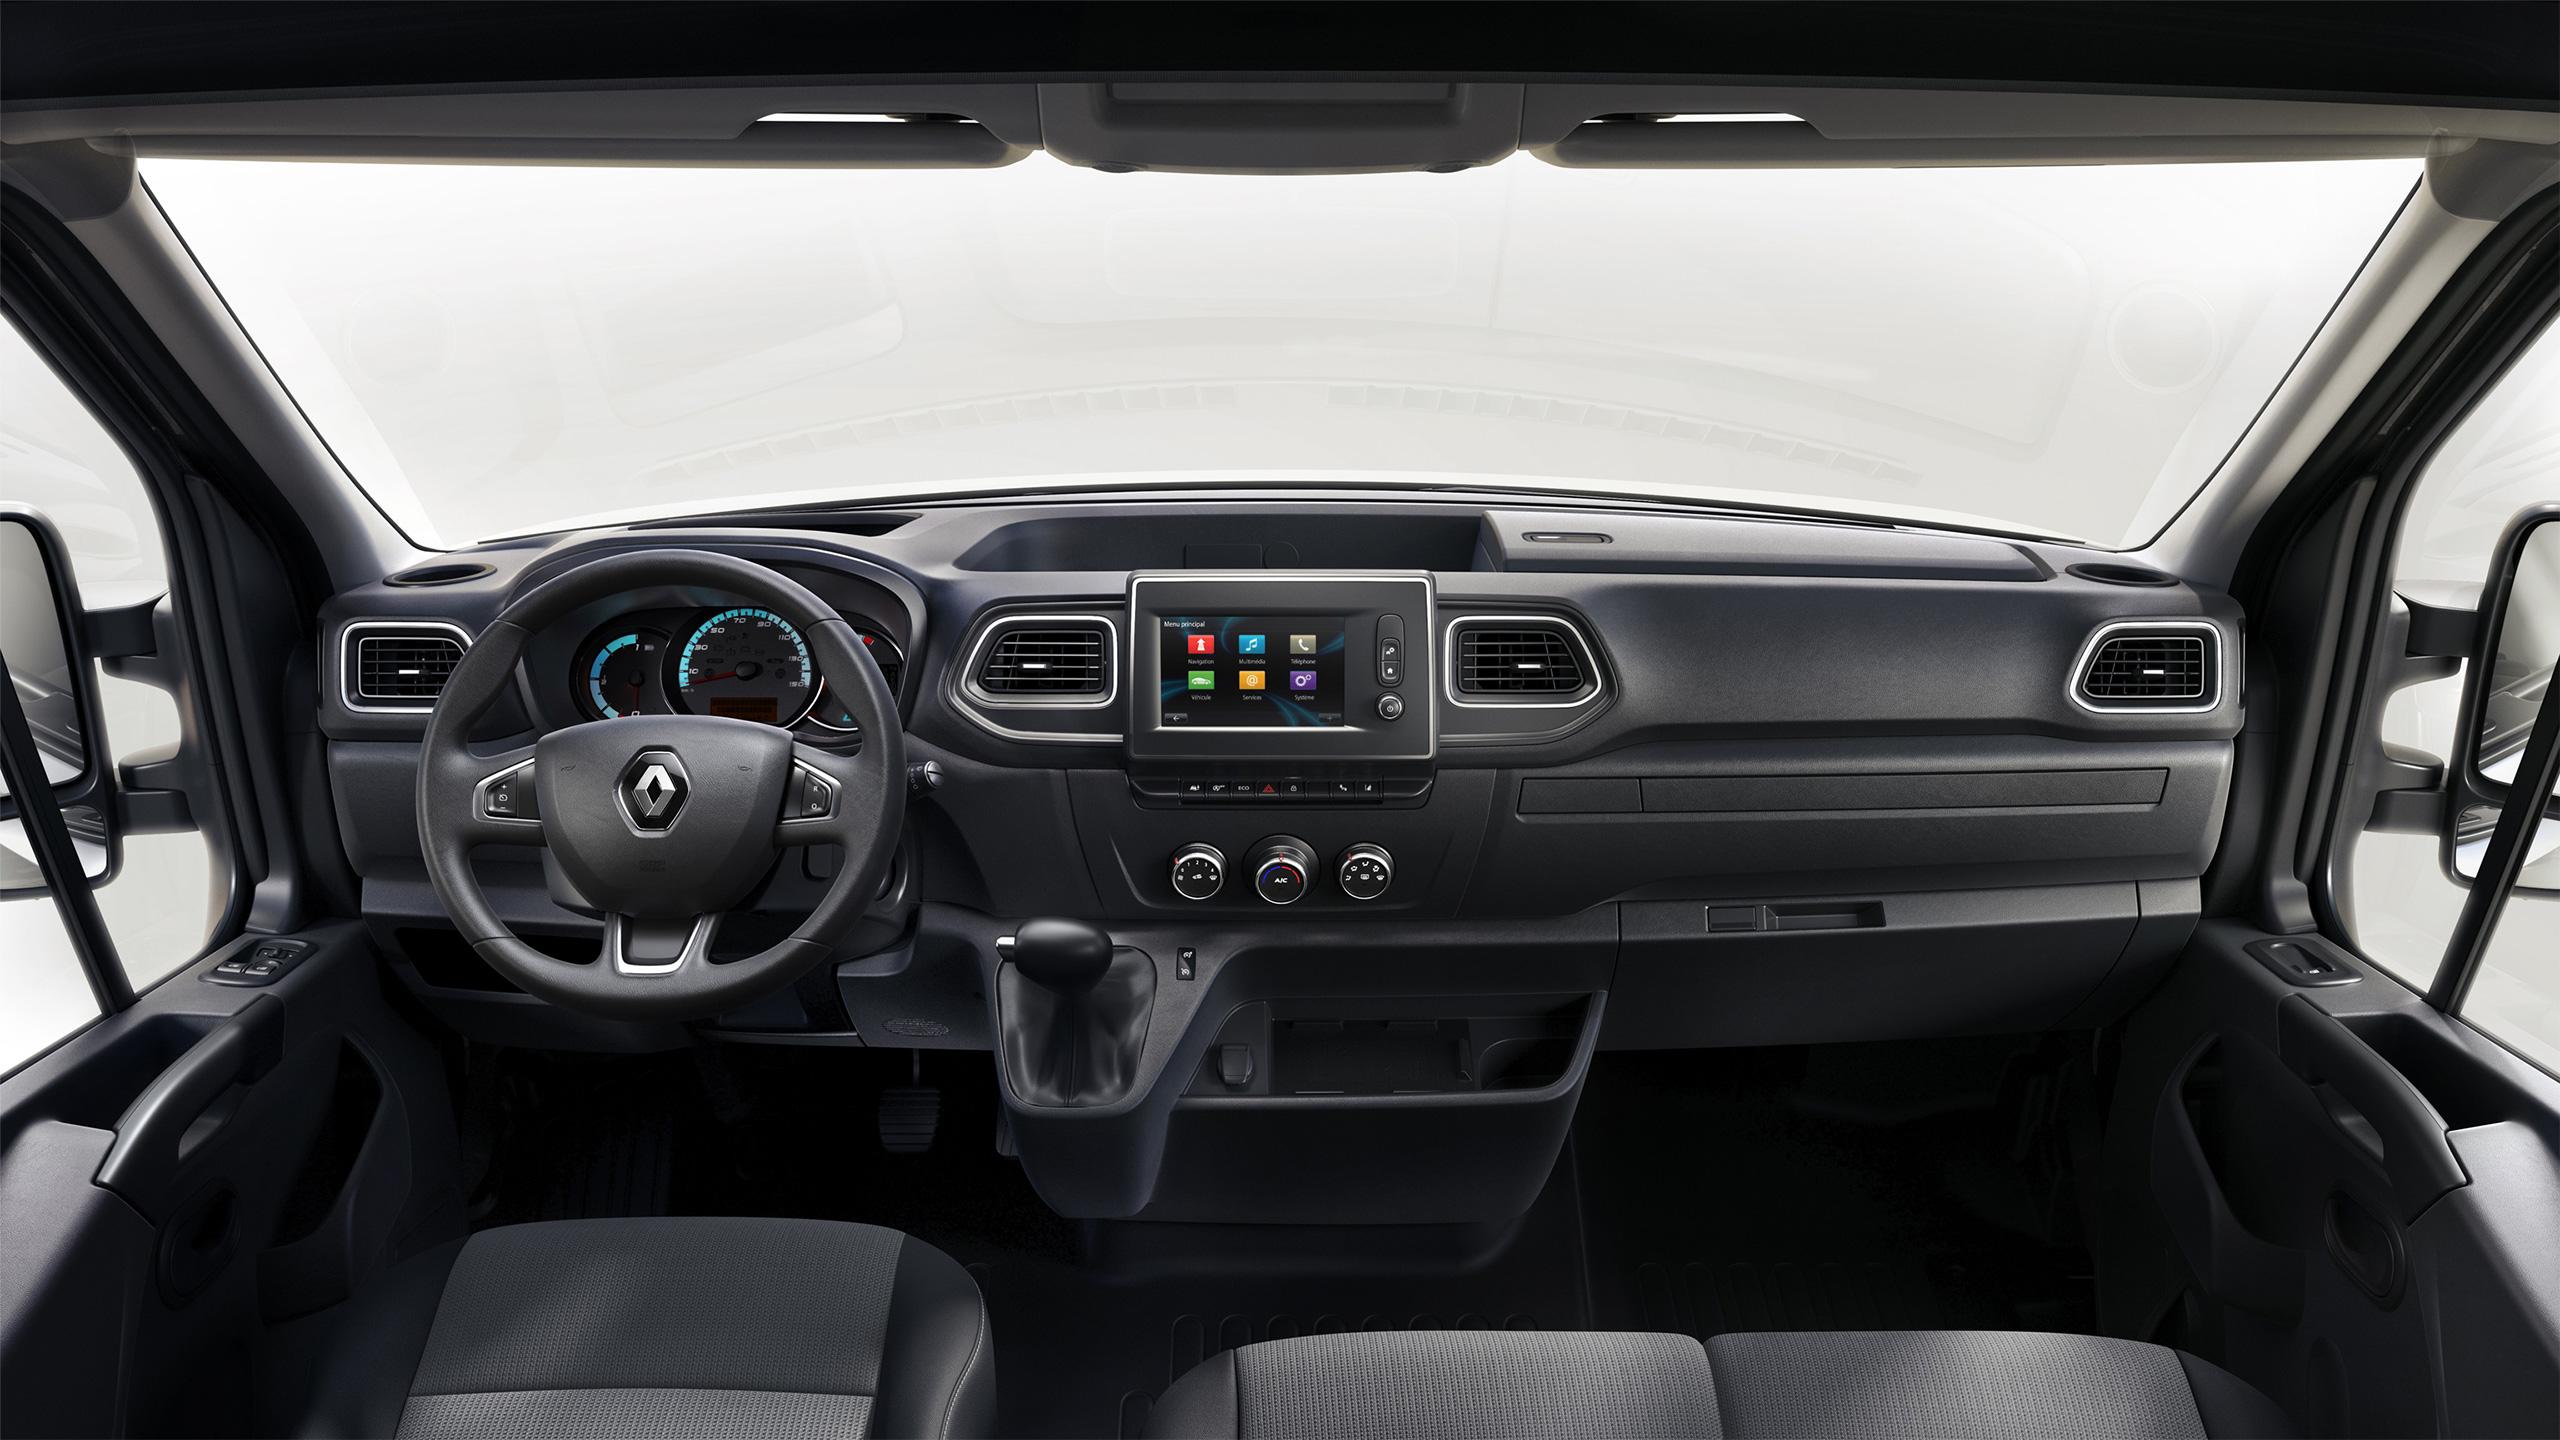 renault-master-ze1-ph2-interior-3d-003.jpg